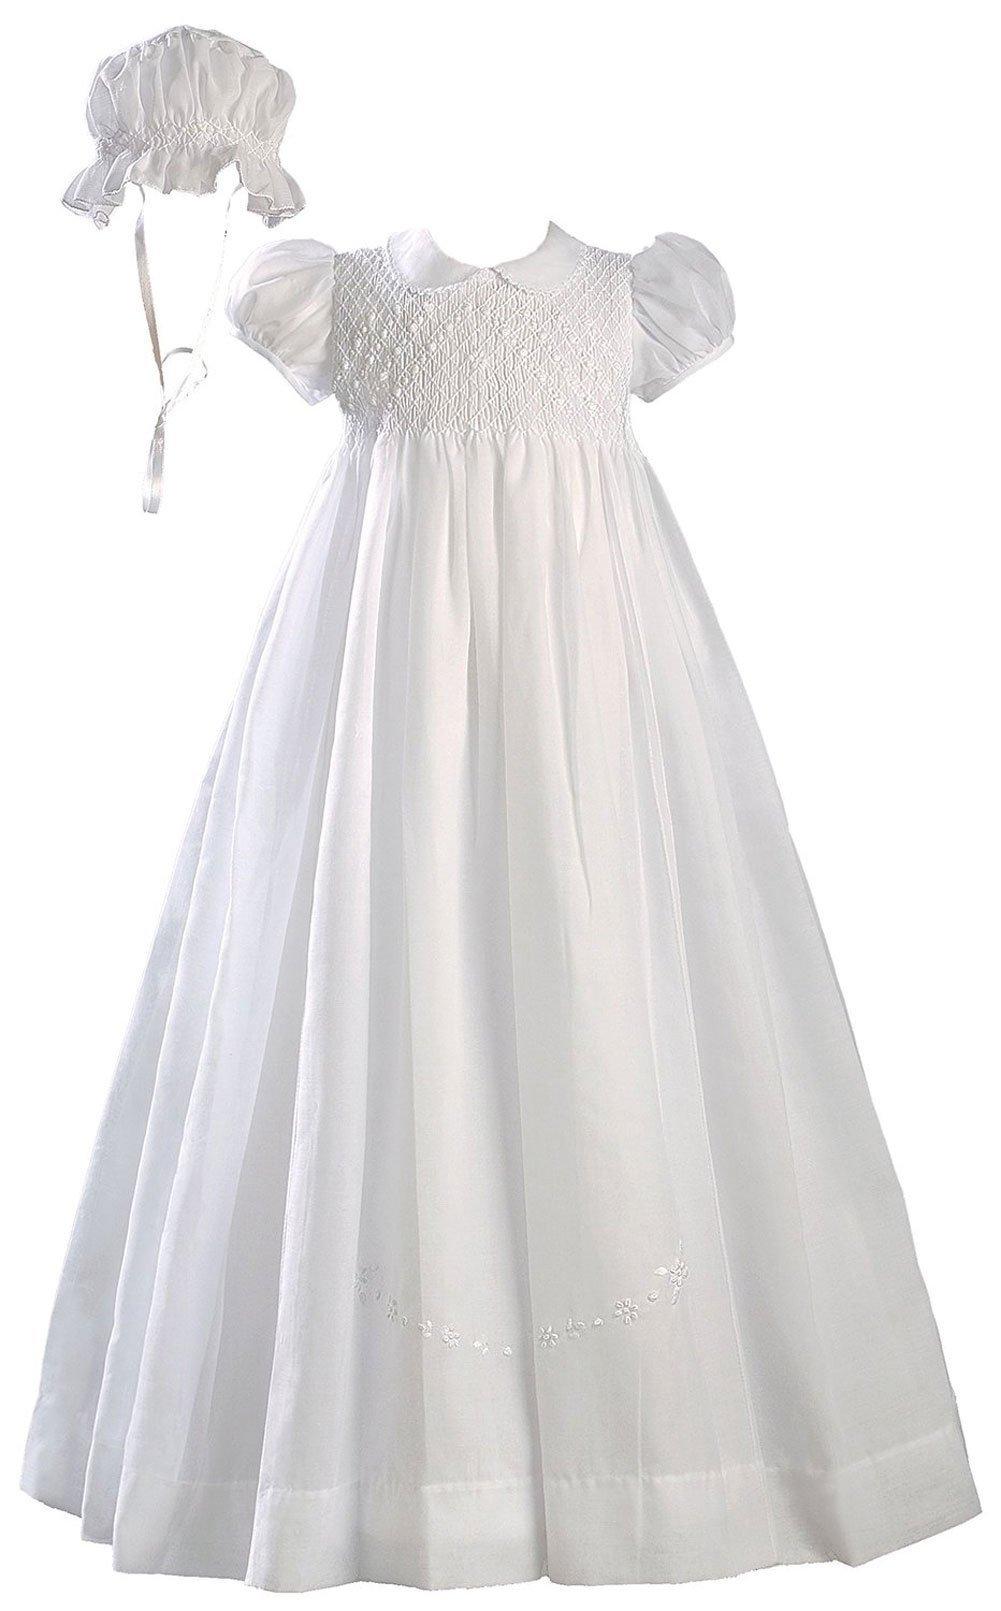 Brianna Polycotton Christening Gown